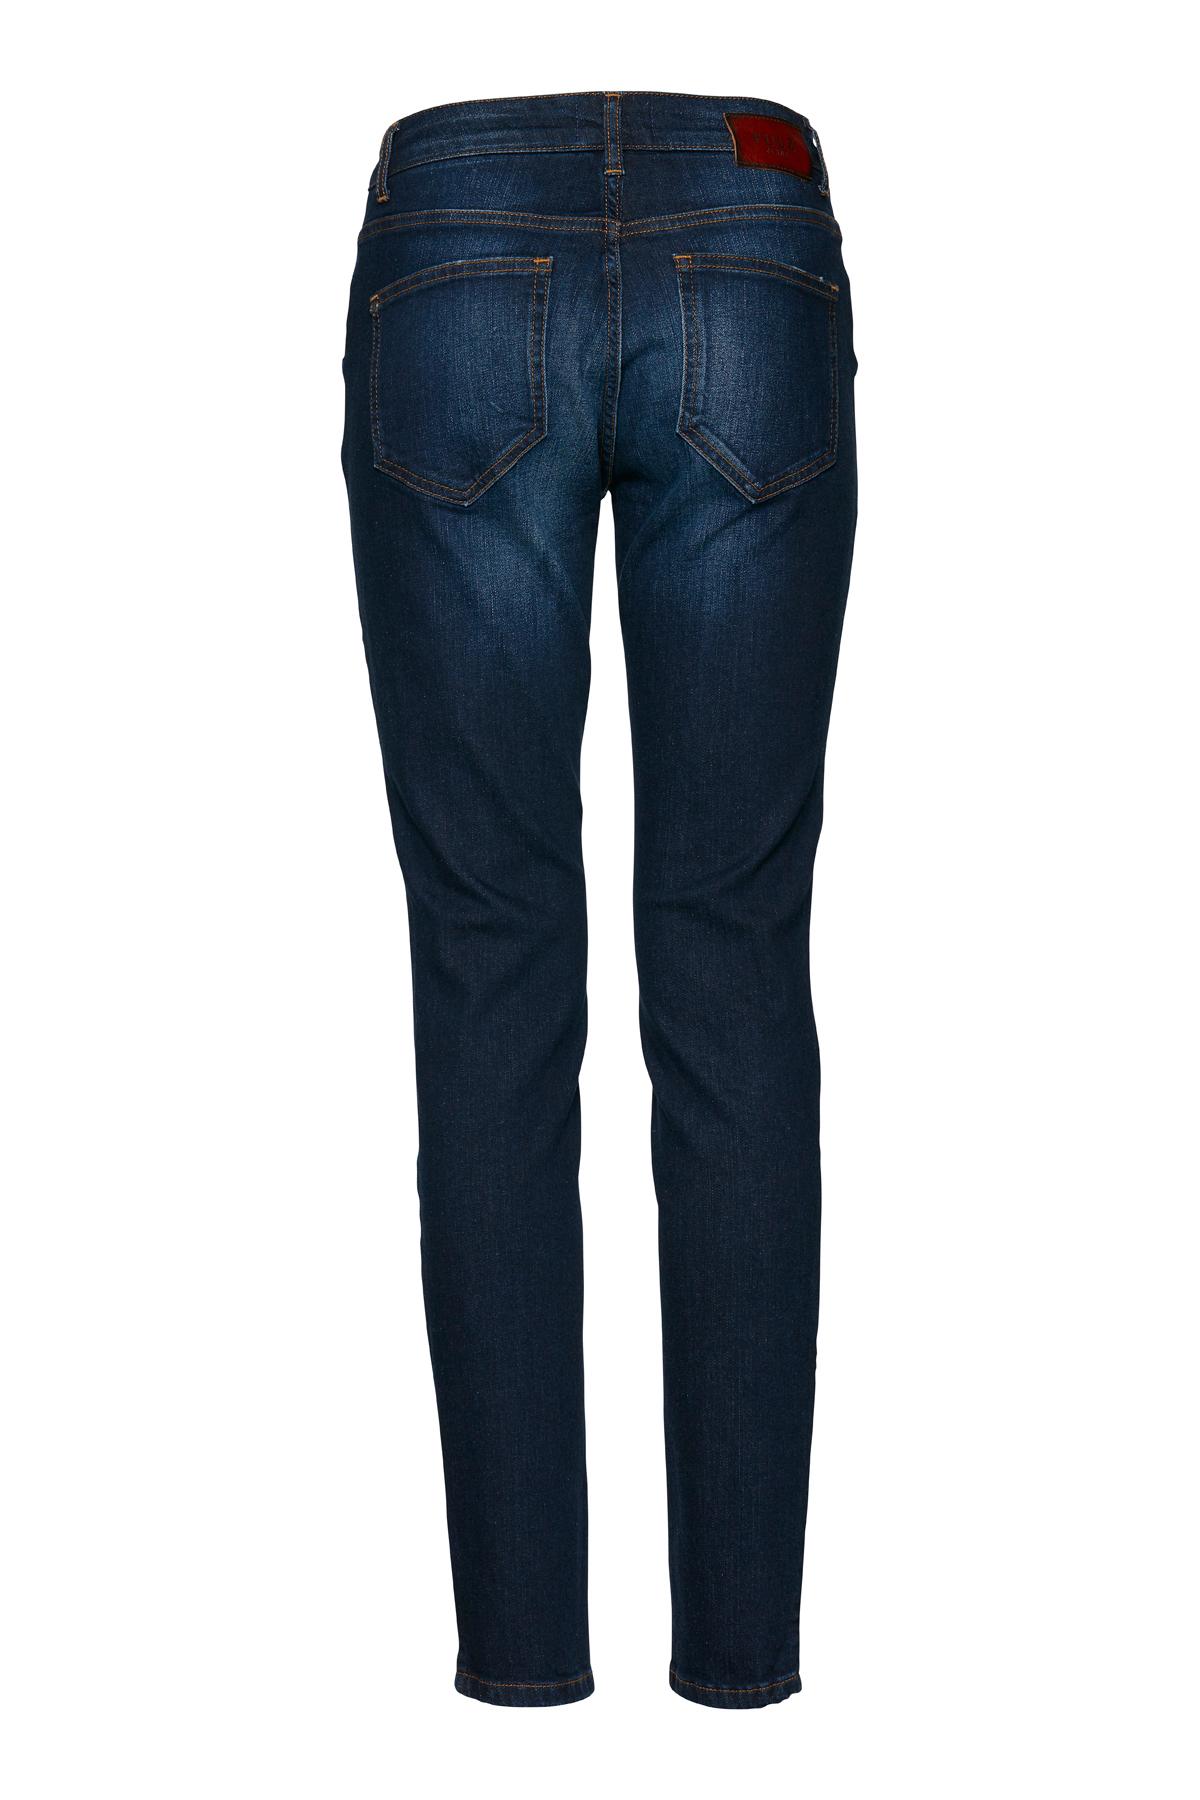 Mörk denimblå Jeans från Pulz Jeans – Köp Mörk denimblå Jeans från stl. 25-34 här